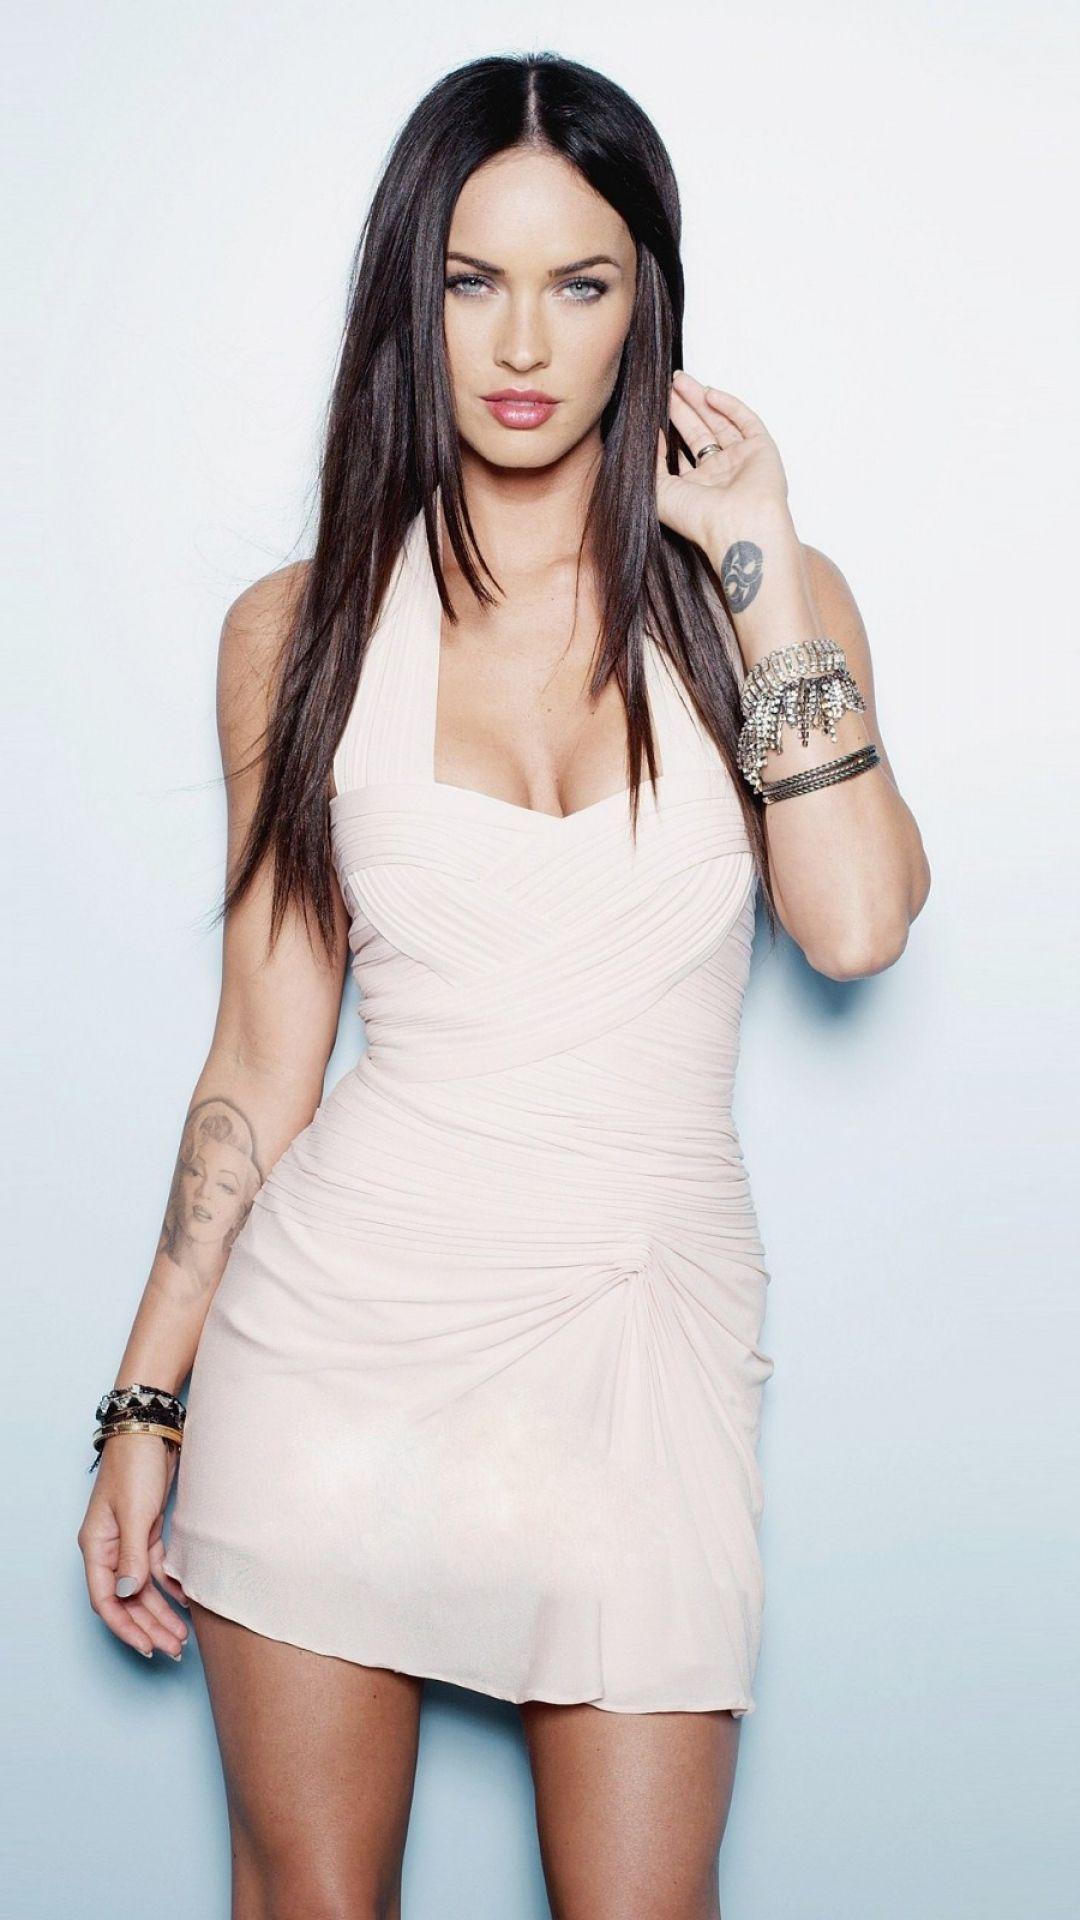 Obr Zky Google Megan Fox Transformers Megan Fox Photos Megan Fox Hot